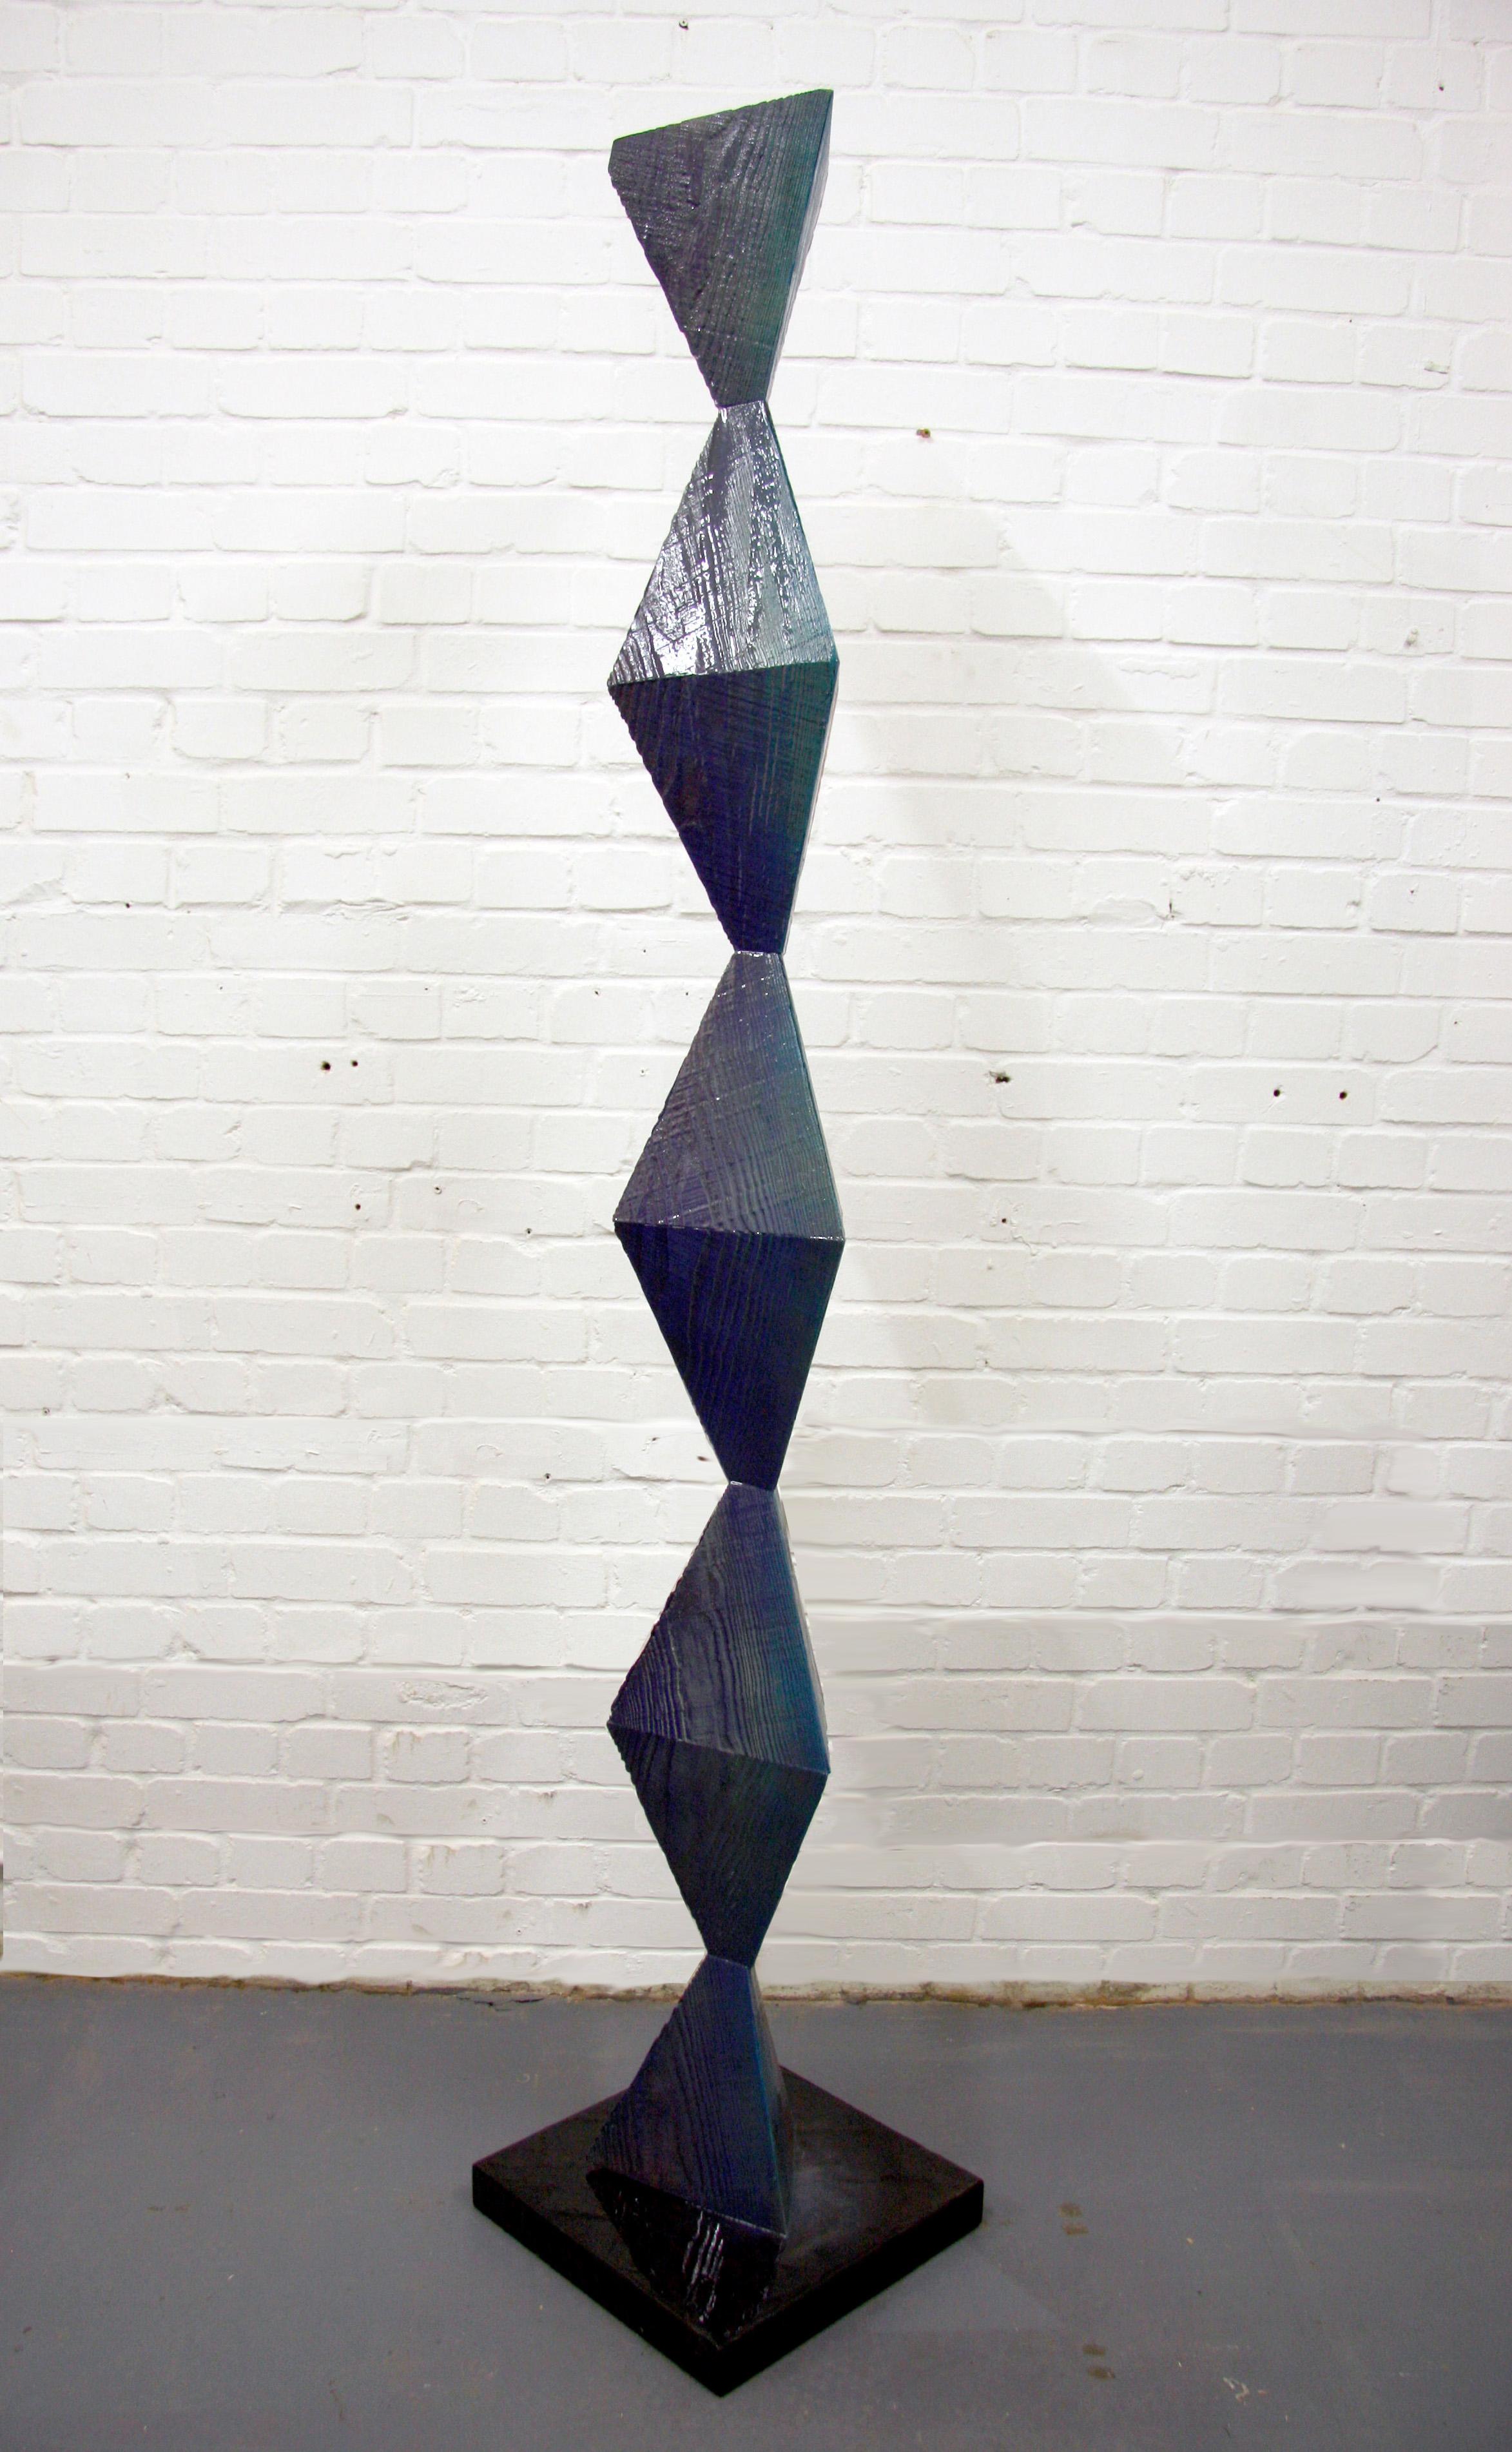 Untitled (column II), 2019